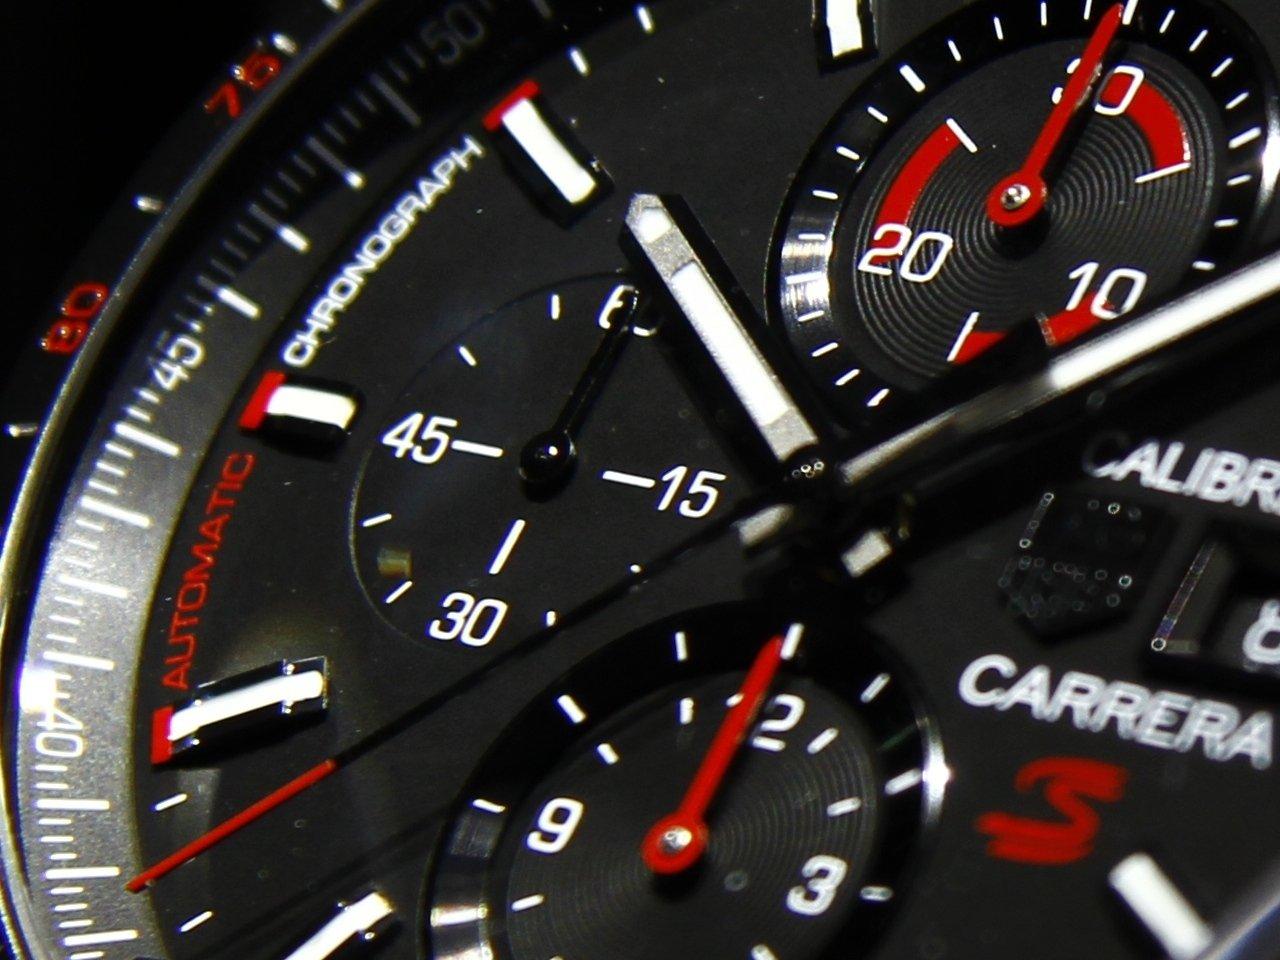 baselworld_2015-tag-heuer-calibre-16-chronograph-special-edition-senna-0-100_7